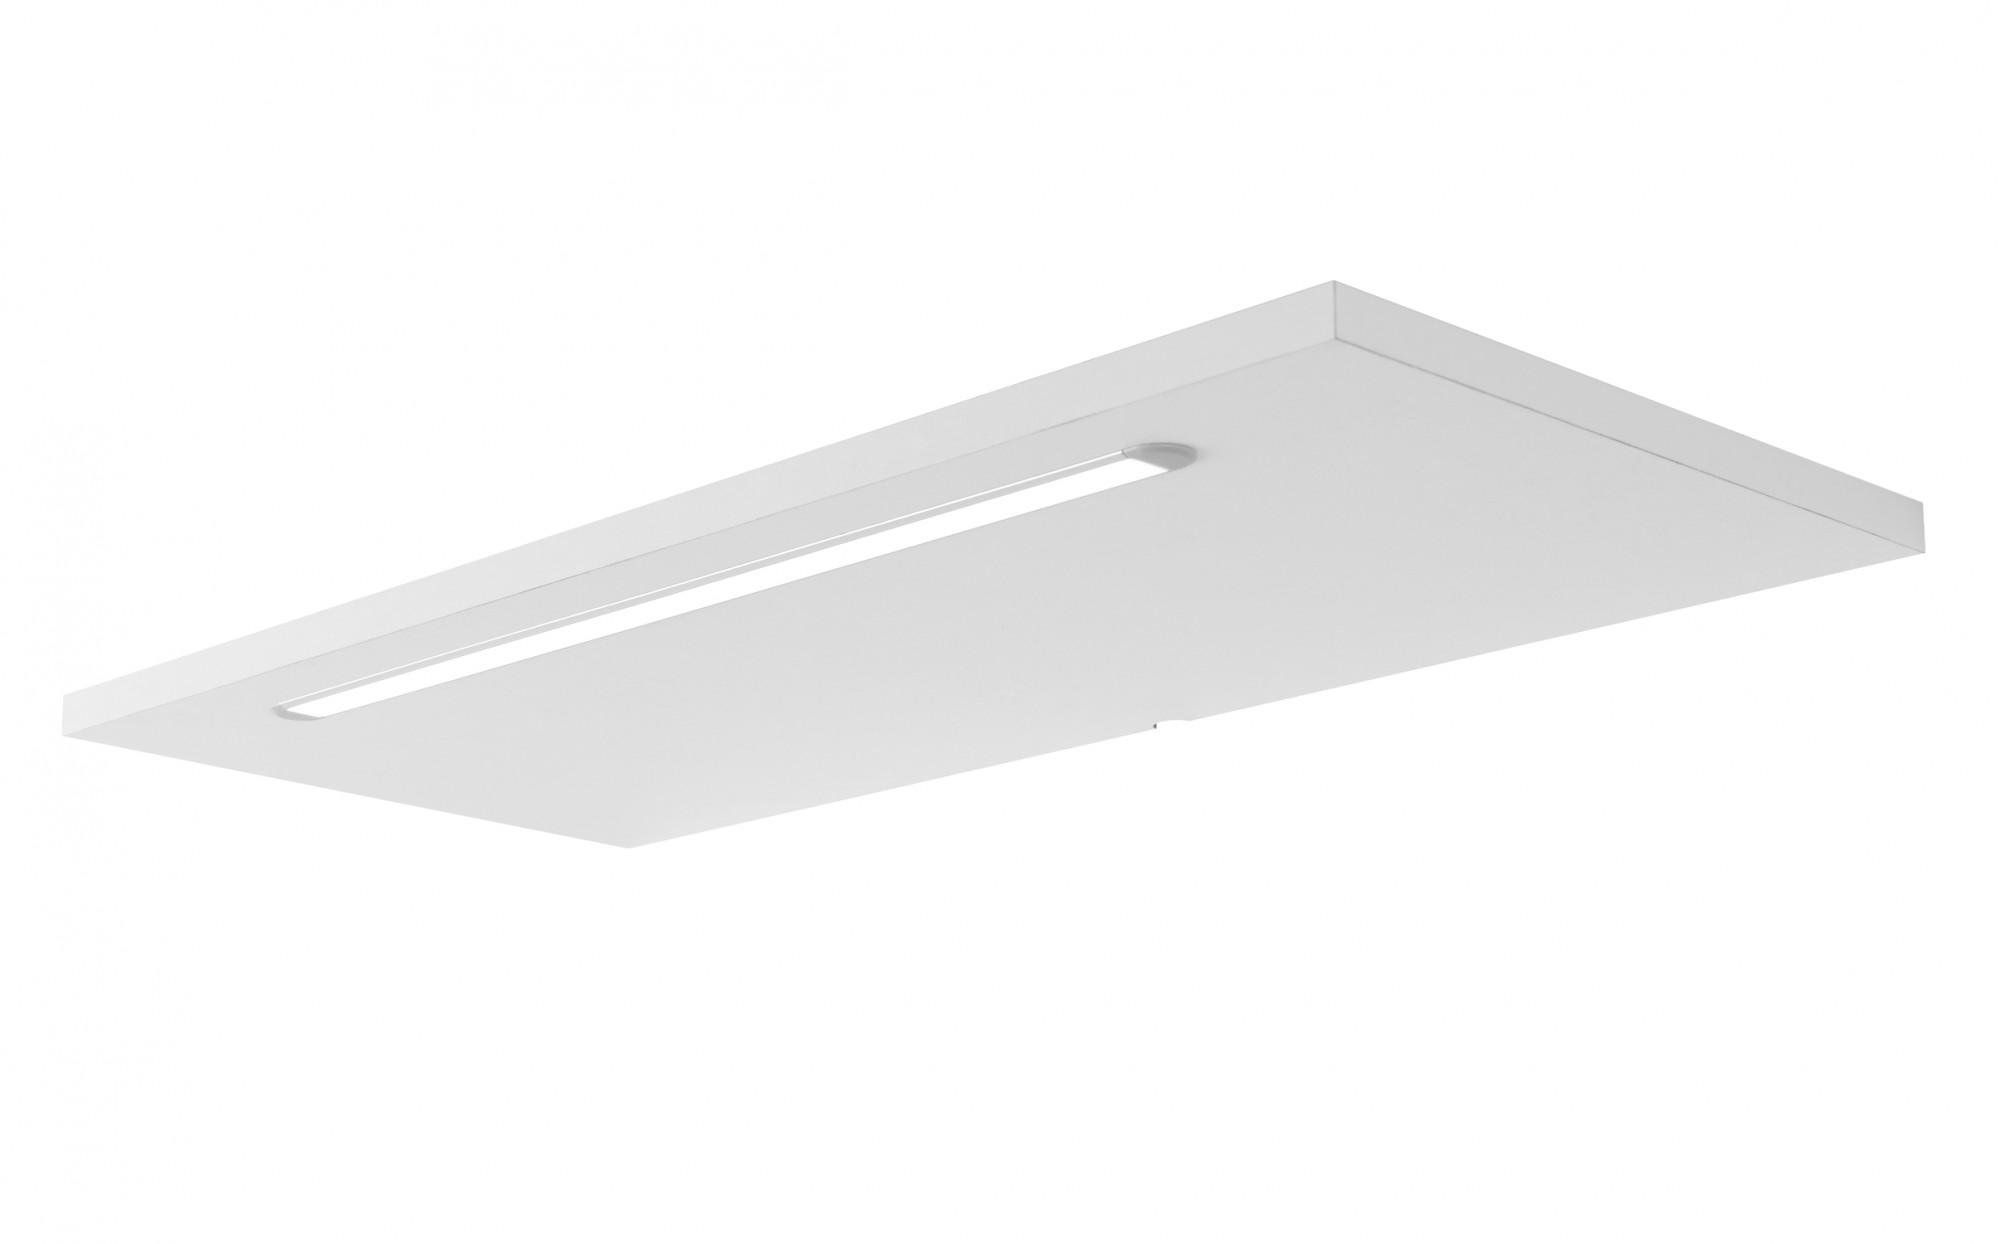 bad spiegelschrank bologna 3 t rig mit led lichtleiste 90 cm breit wei bad bologna. Black Bedroom Furniture Sets. Home Design Ideas